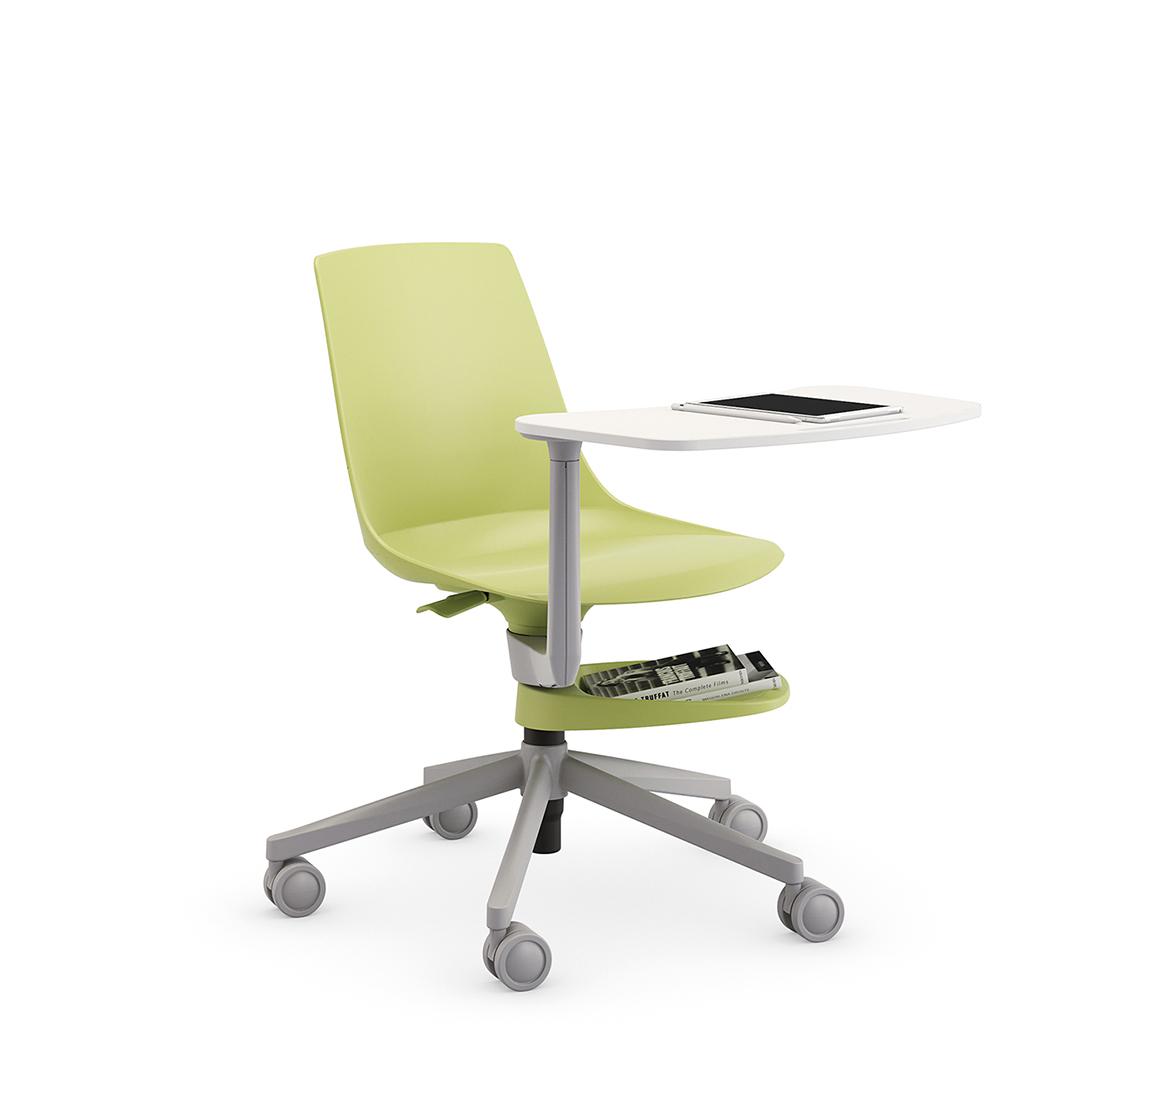 Klc de alegre design para omp group una silla para for Sedia omp